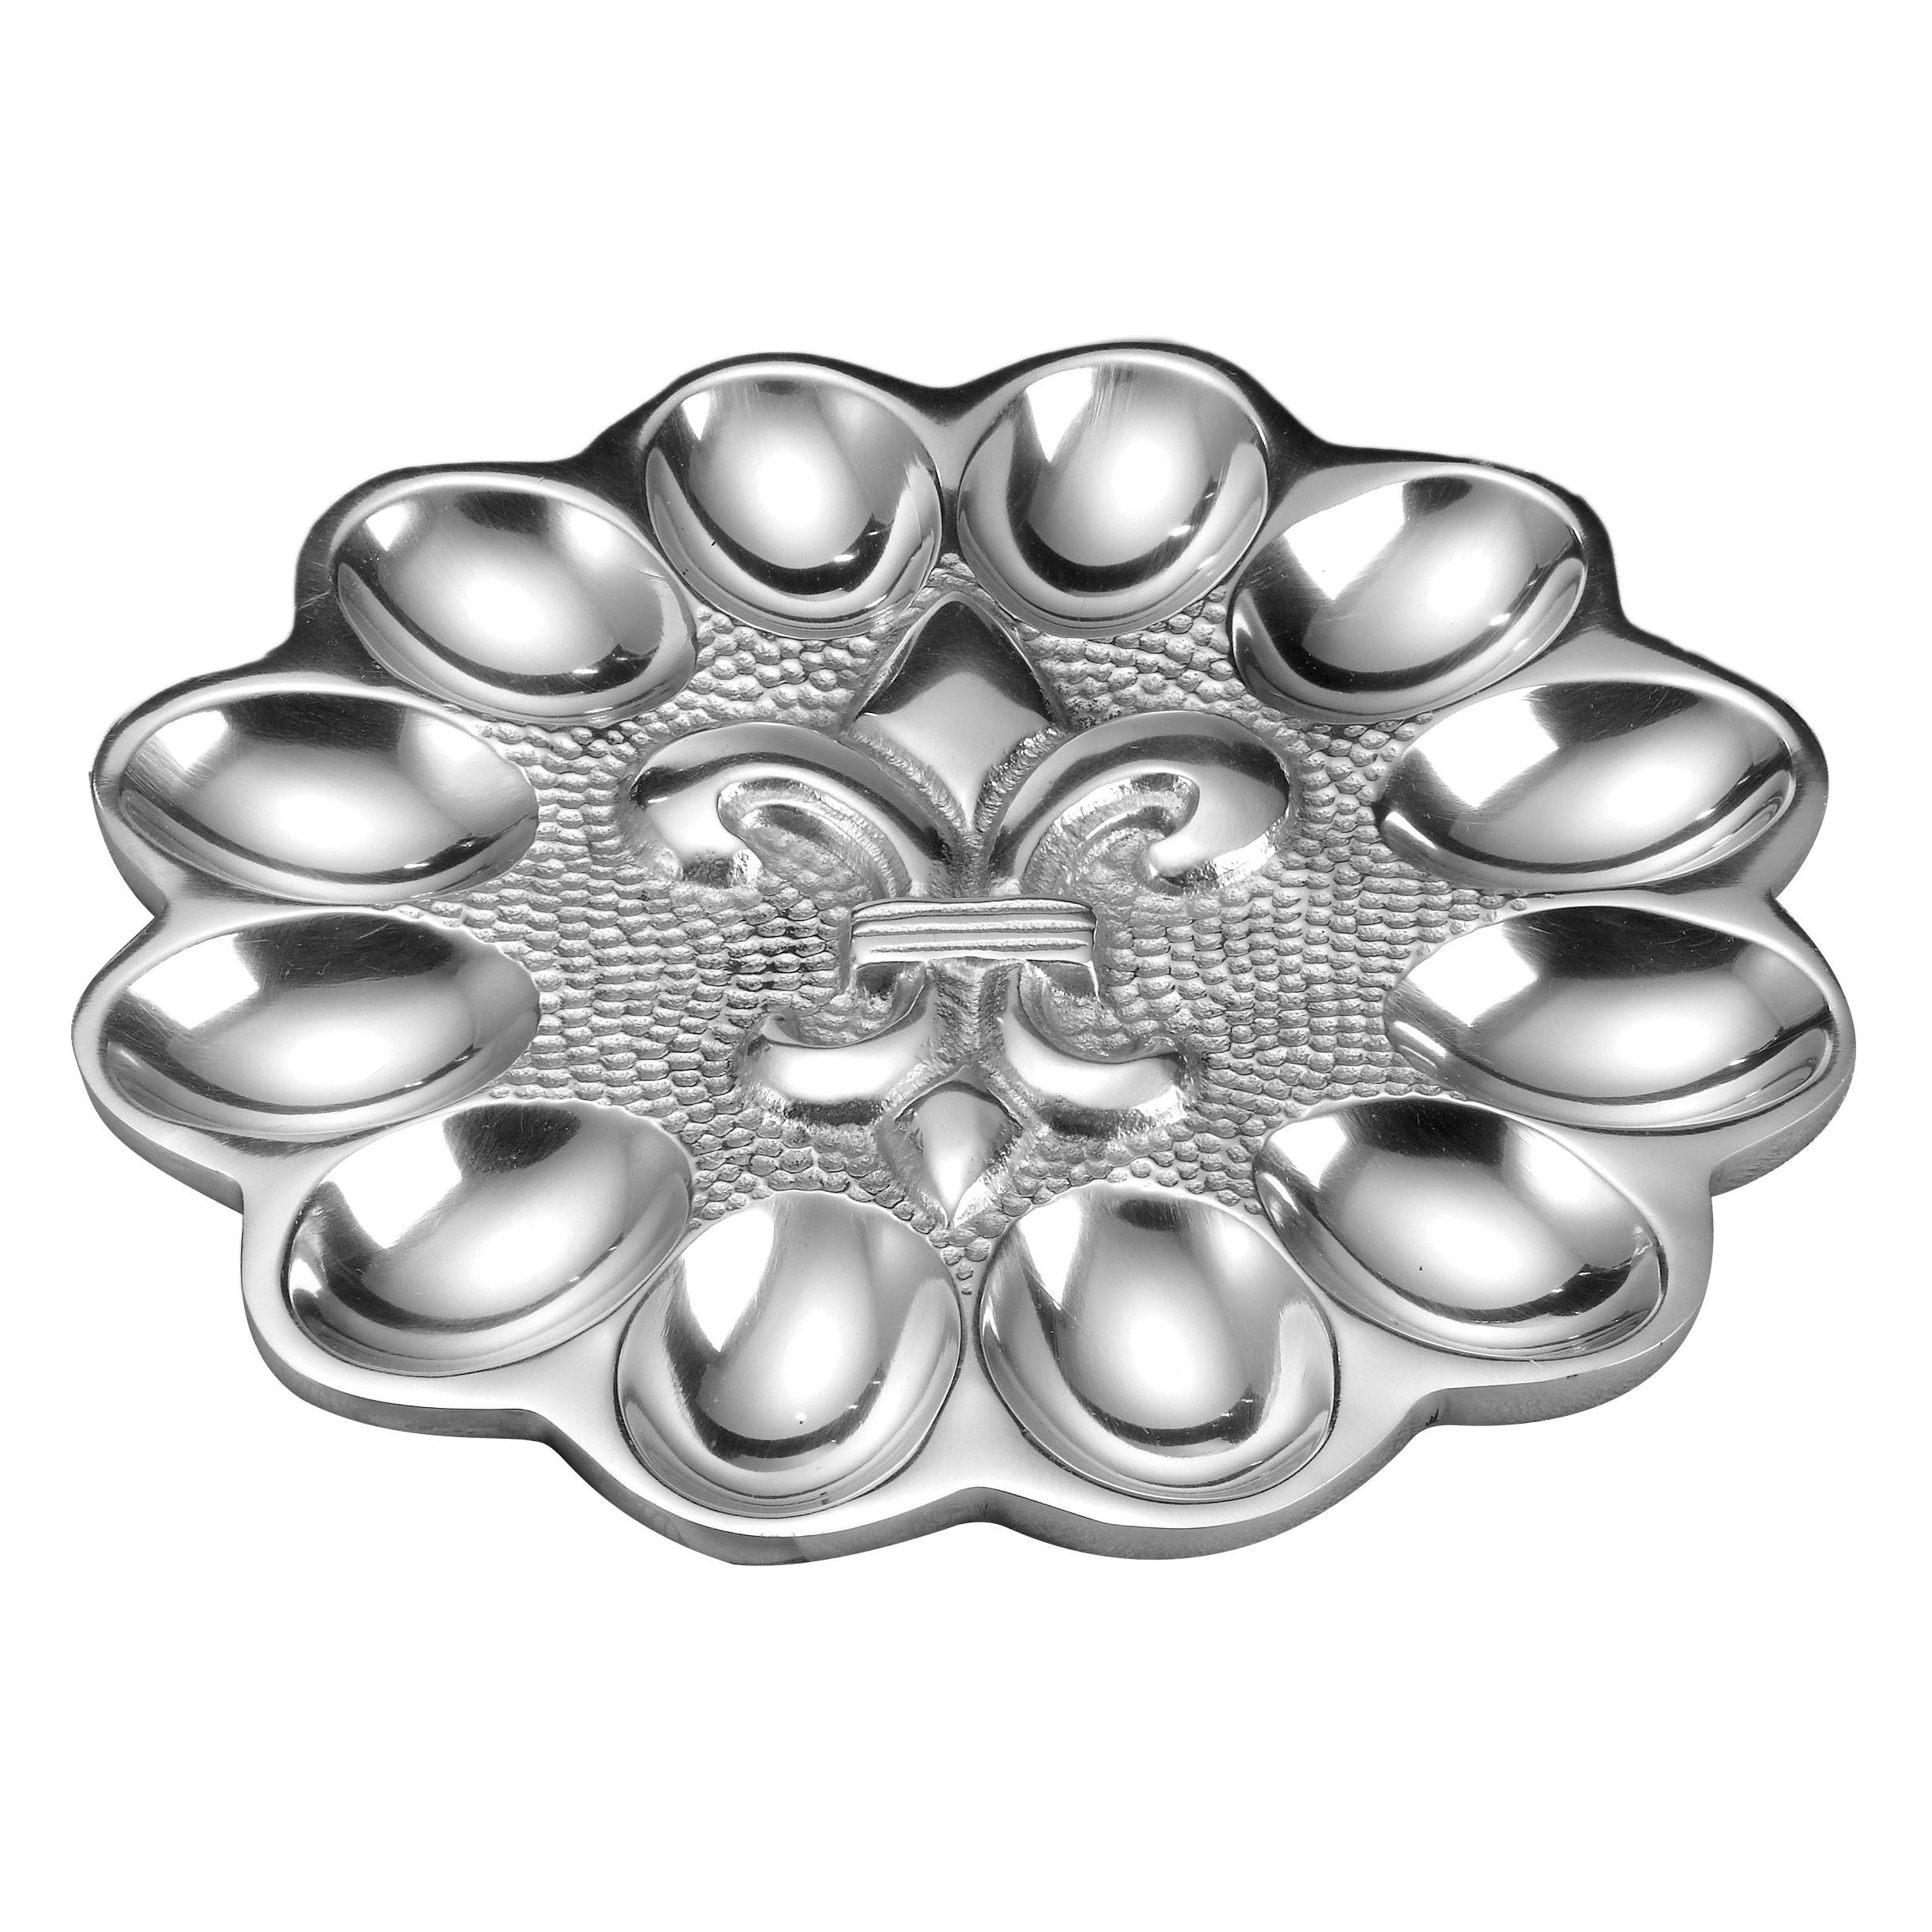 St. Croix KINDWER Scalloped Fleur de Lis Egg Tray, Silver...